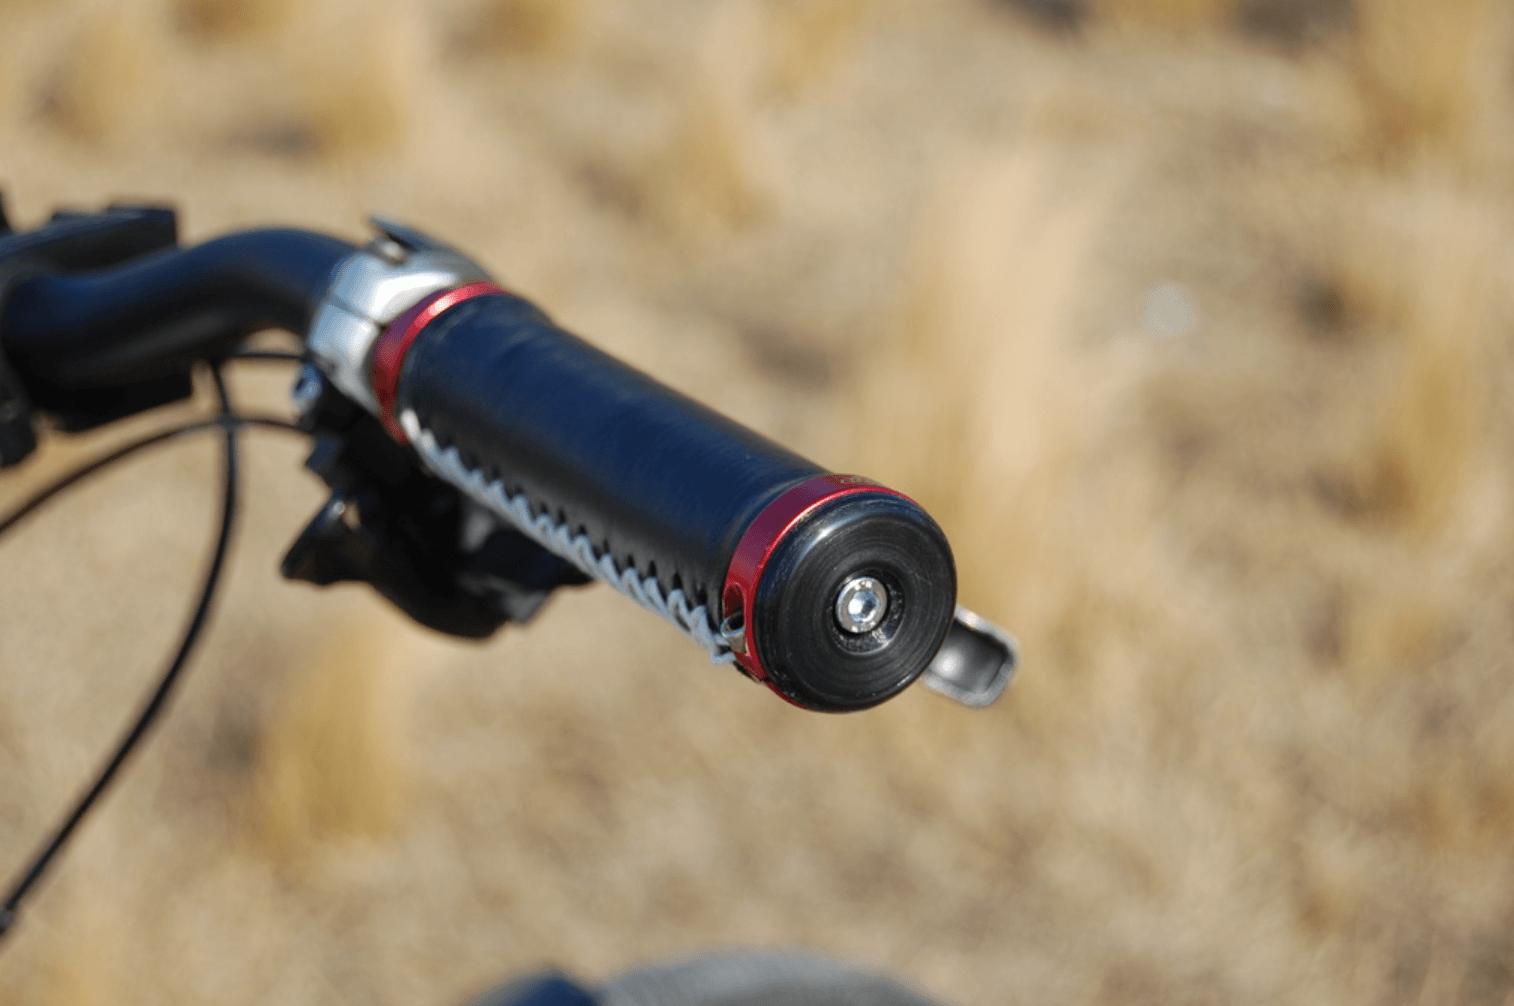 Capture d'écran 2018-02-05 à 10.39.52.png Download free STL file Bar-End bike Plugs • Object to 3D print, Stamos